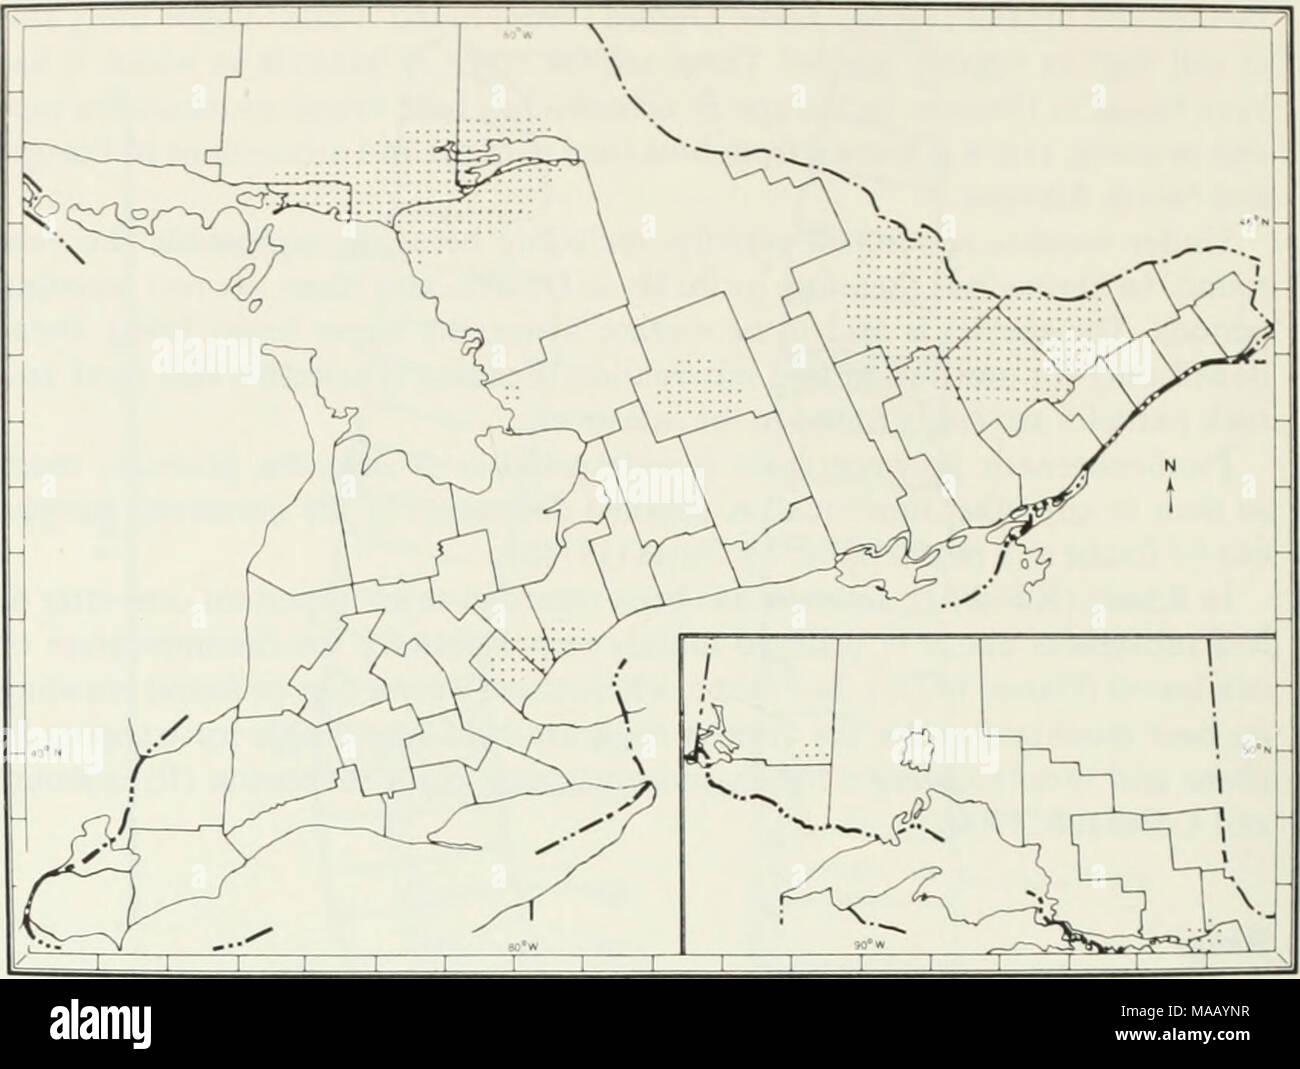 Go Home Lake Ontario Muskoka 17 x 22 Paper Wall Map